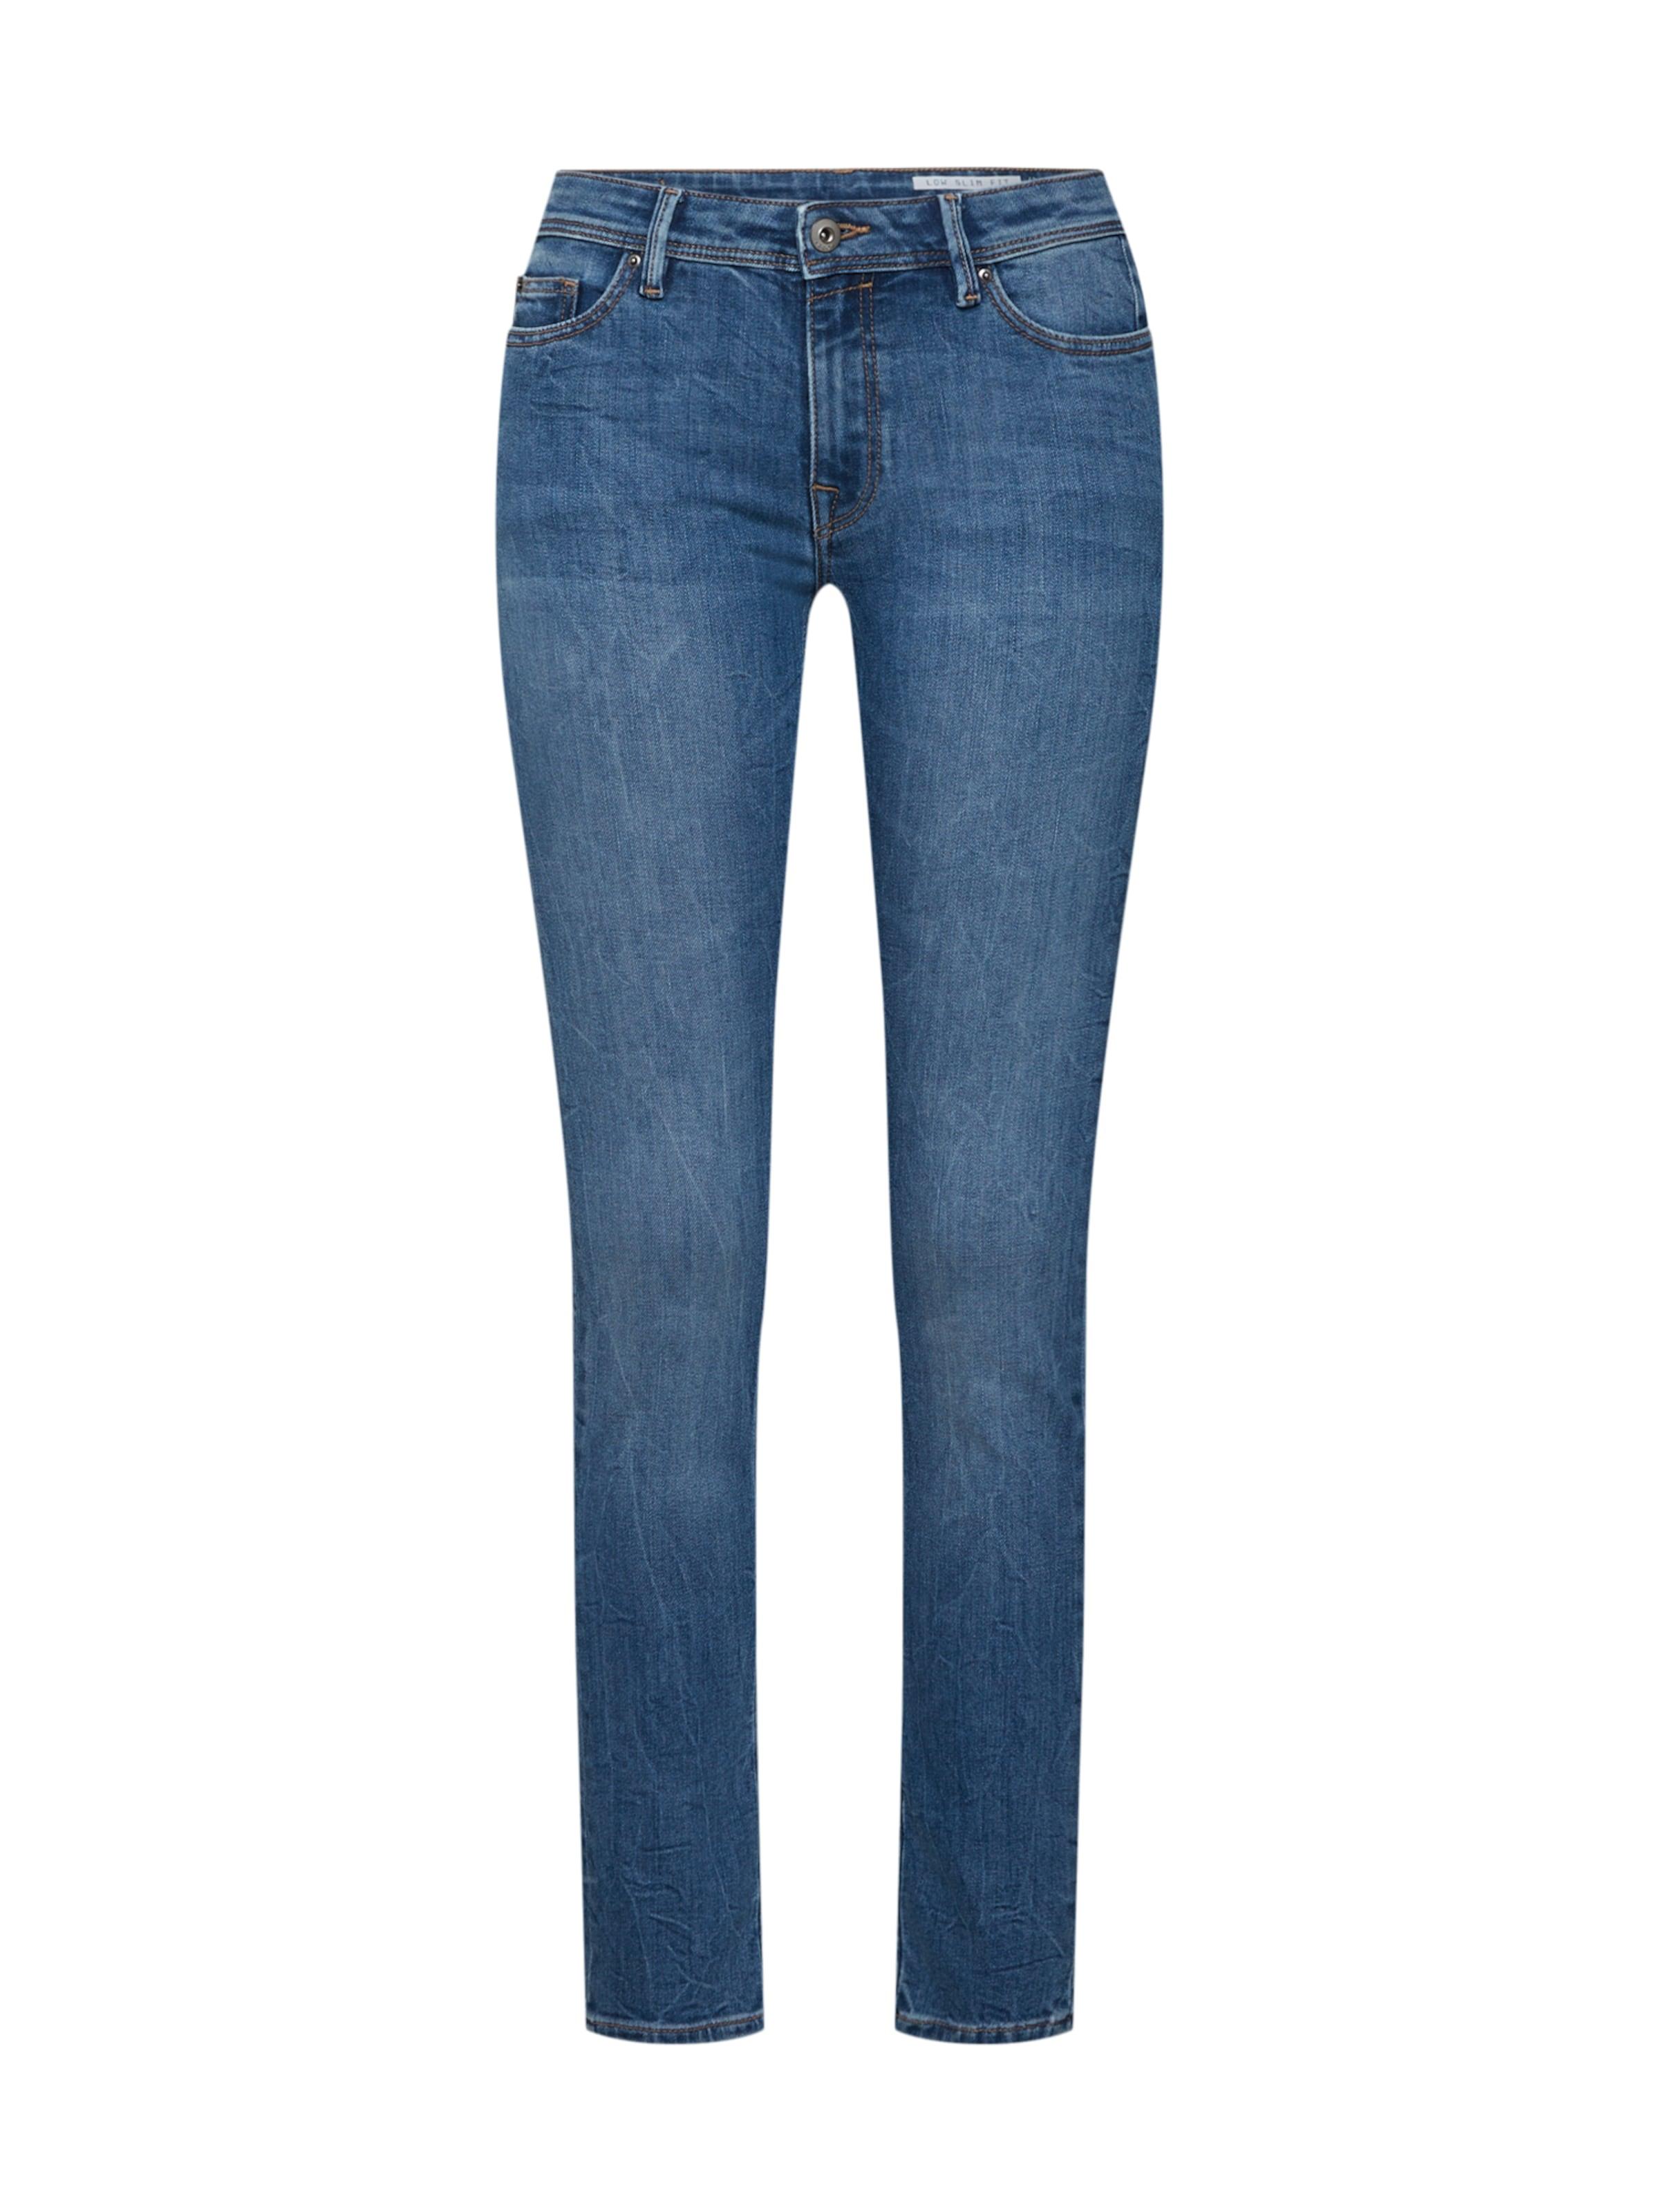 Denim' Jean Slim Esprit Lr 'rcs En Edc Bleu By Denim Pants nwNOvym80P